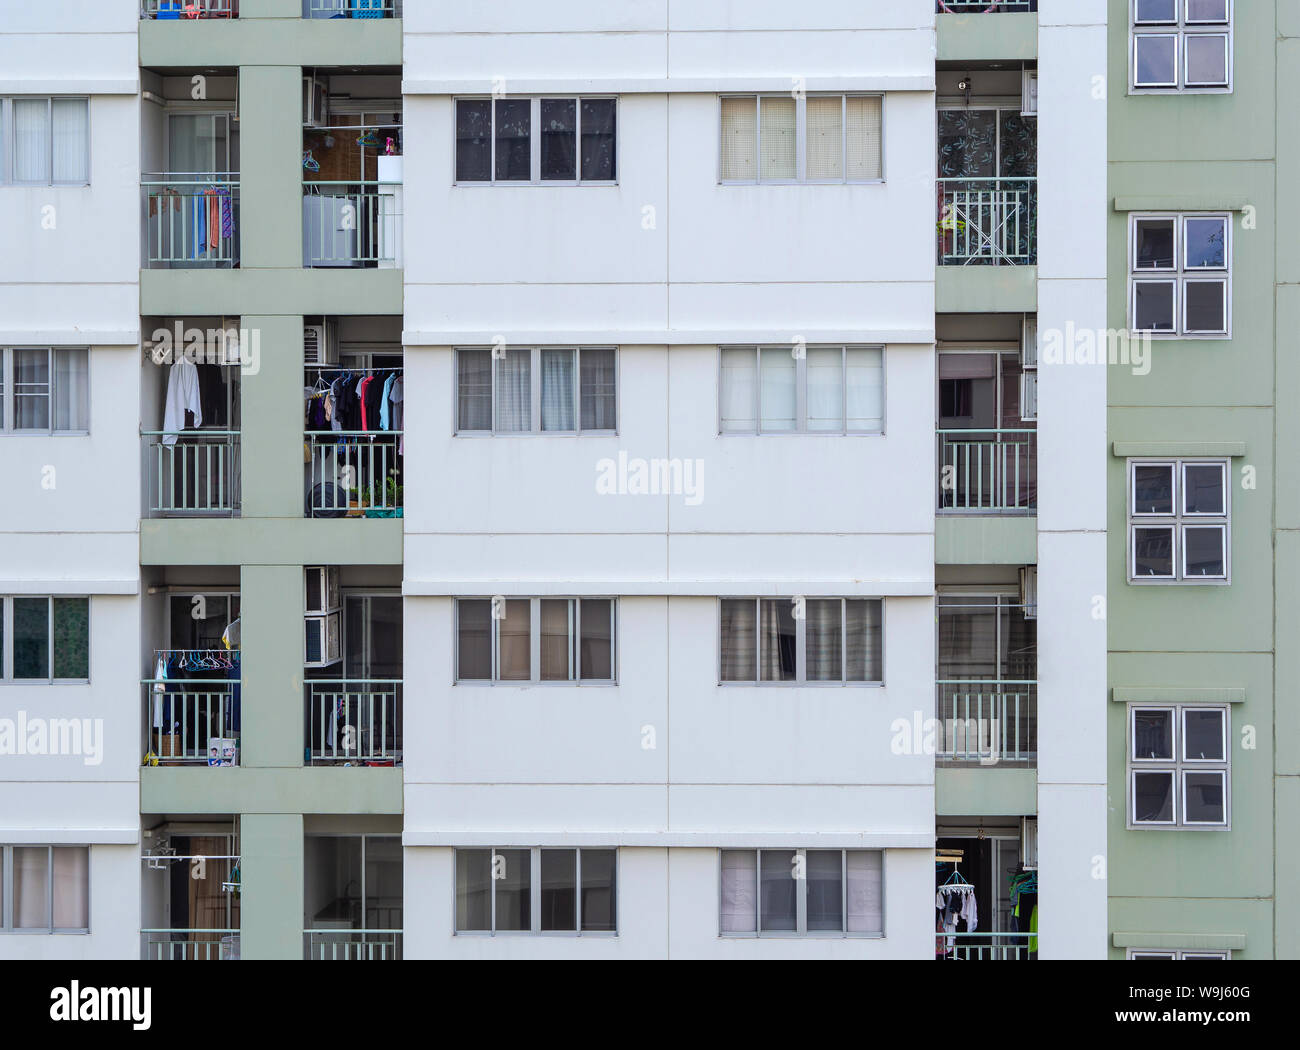 image of condo, Apartment house Stock Photo